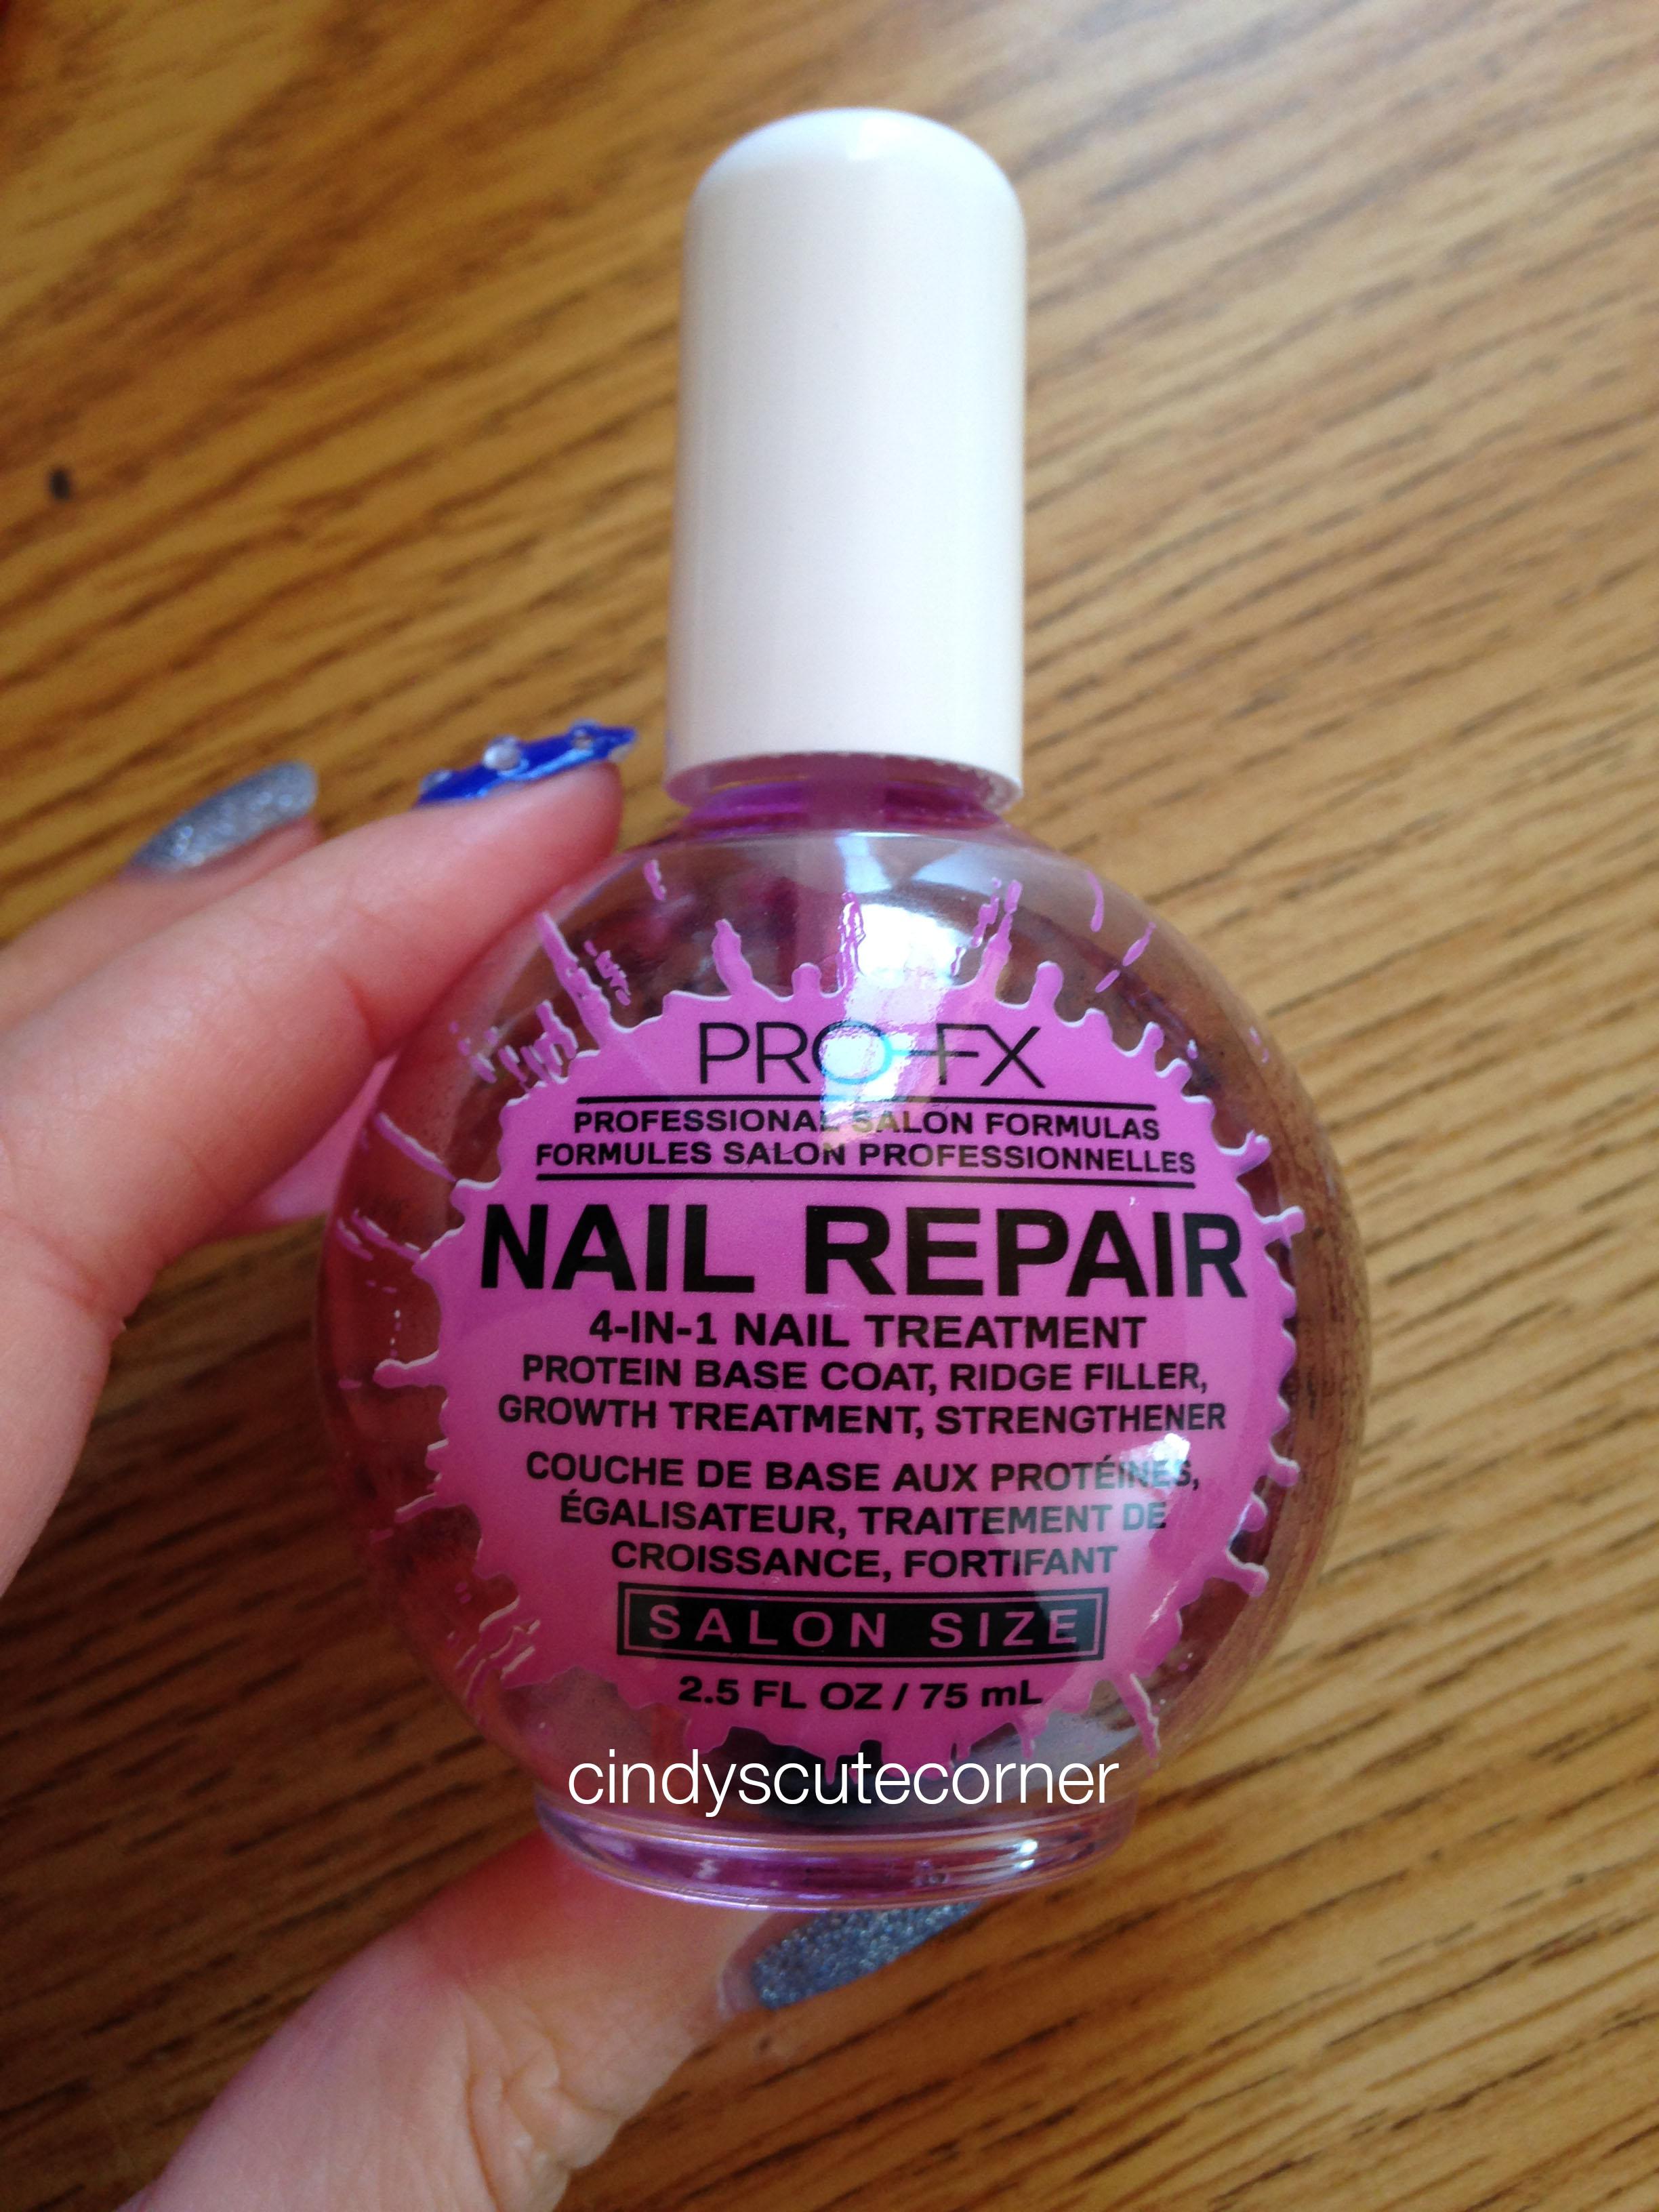 PRO-FX Nail Repair Polish - Cindy\'s Cute Corner